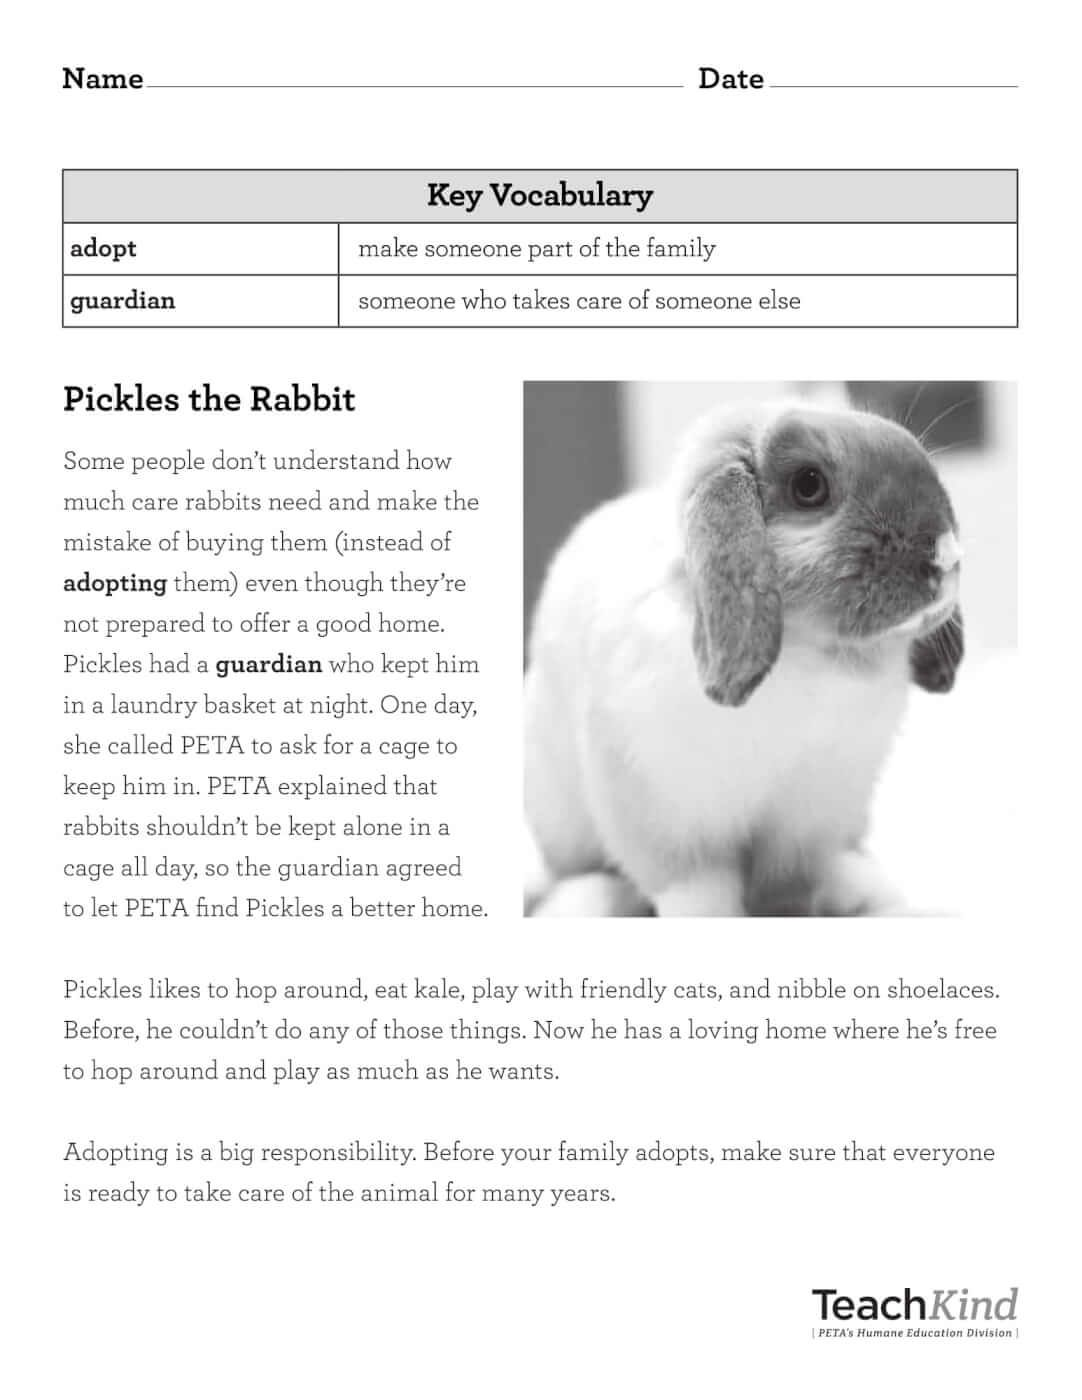 Teachkind Rescue Stories Pickles The Rabbit